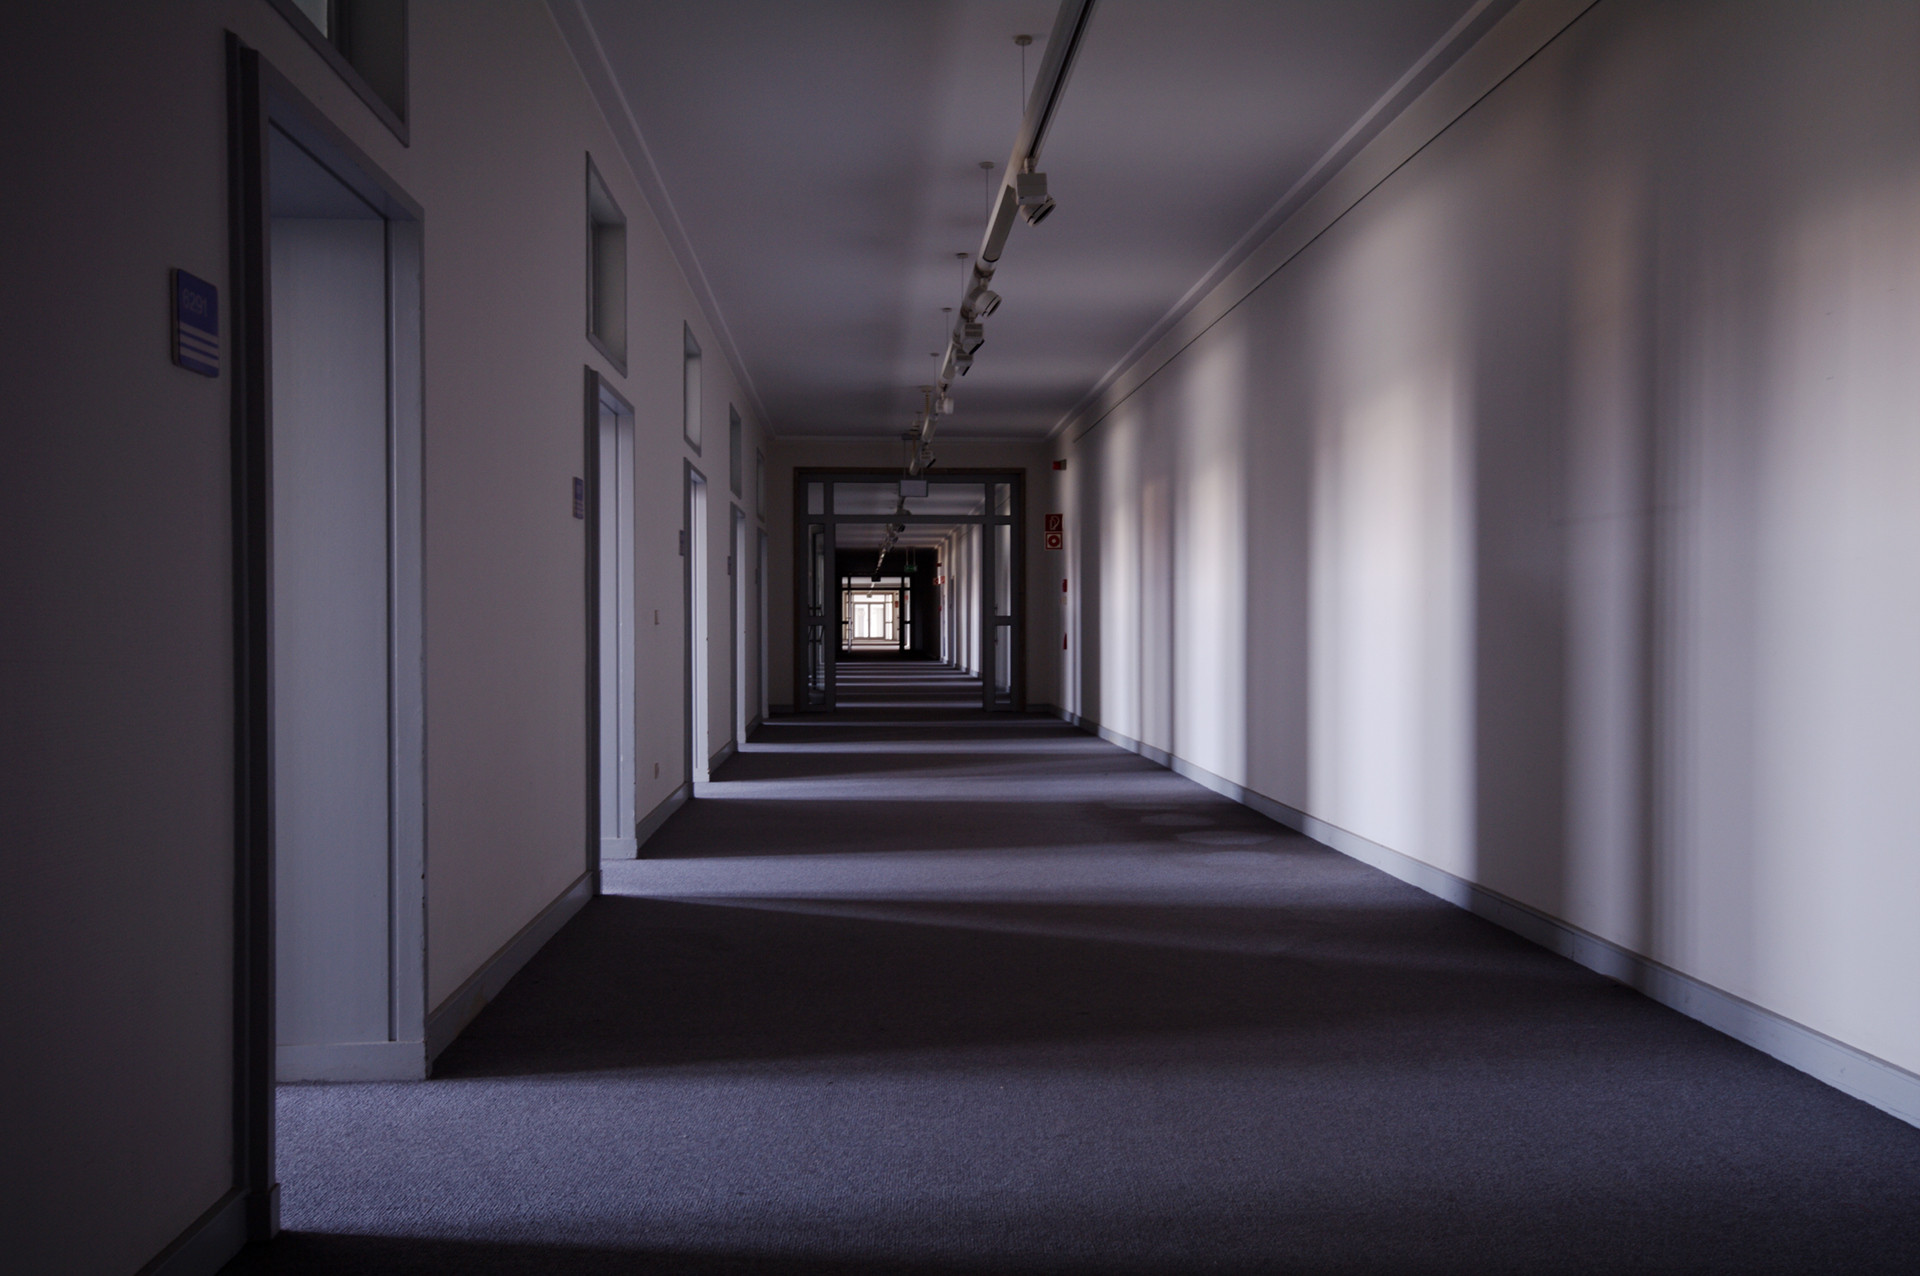 Empty Corridor Tempelhof Gallery District Noir